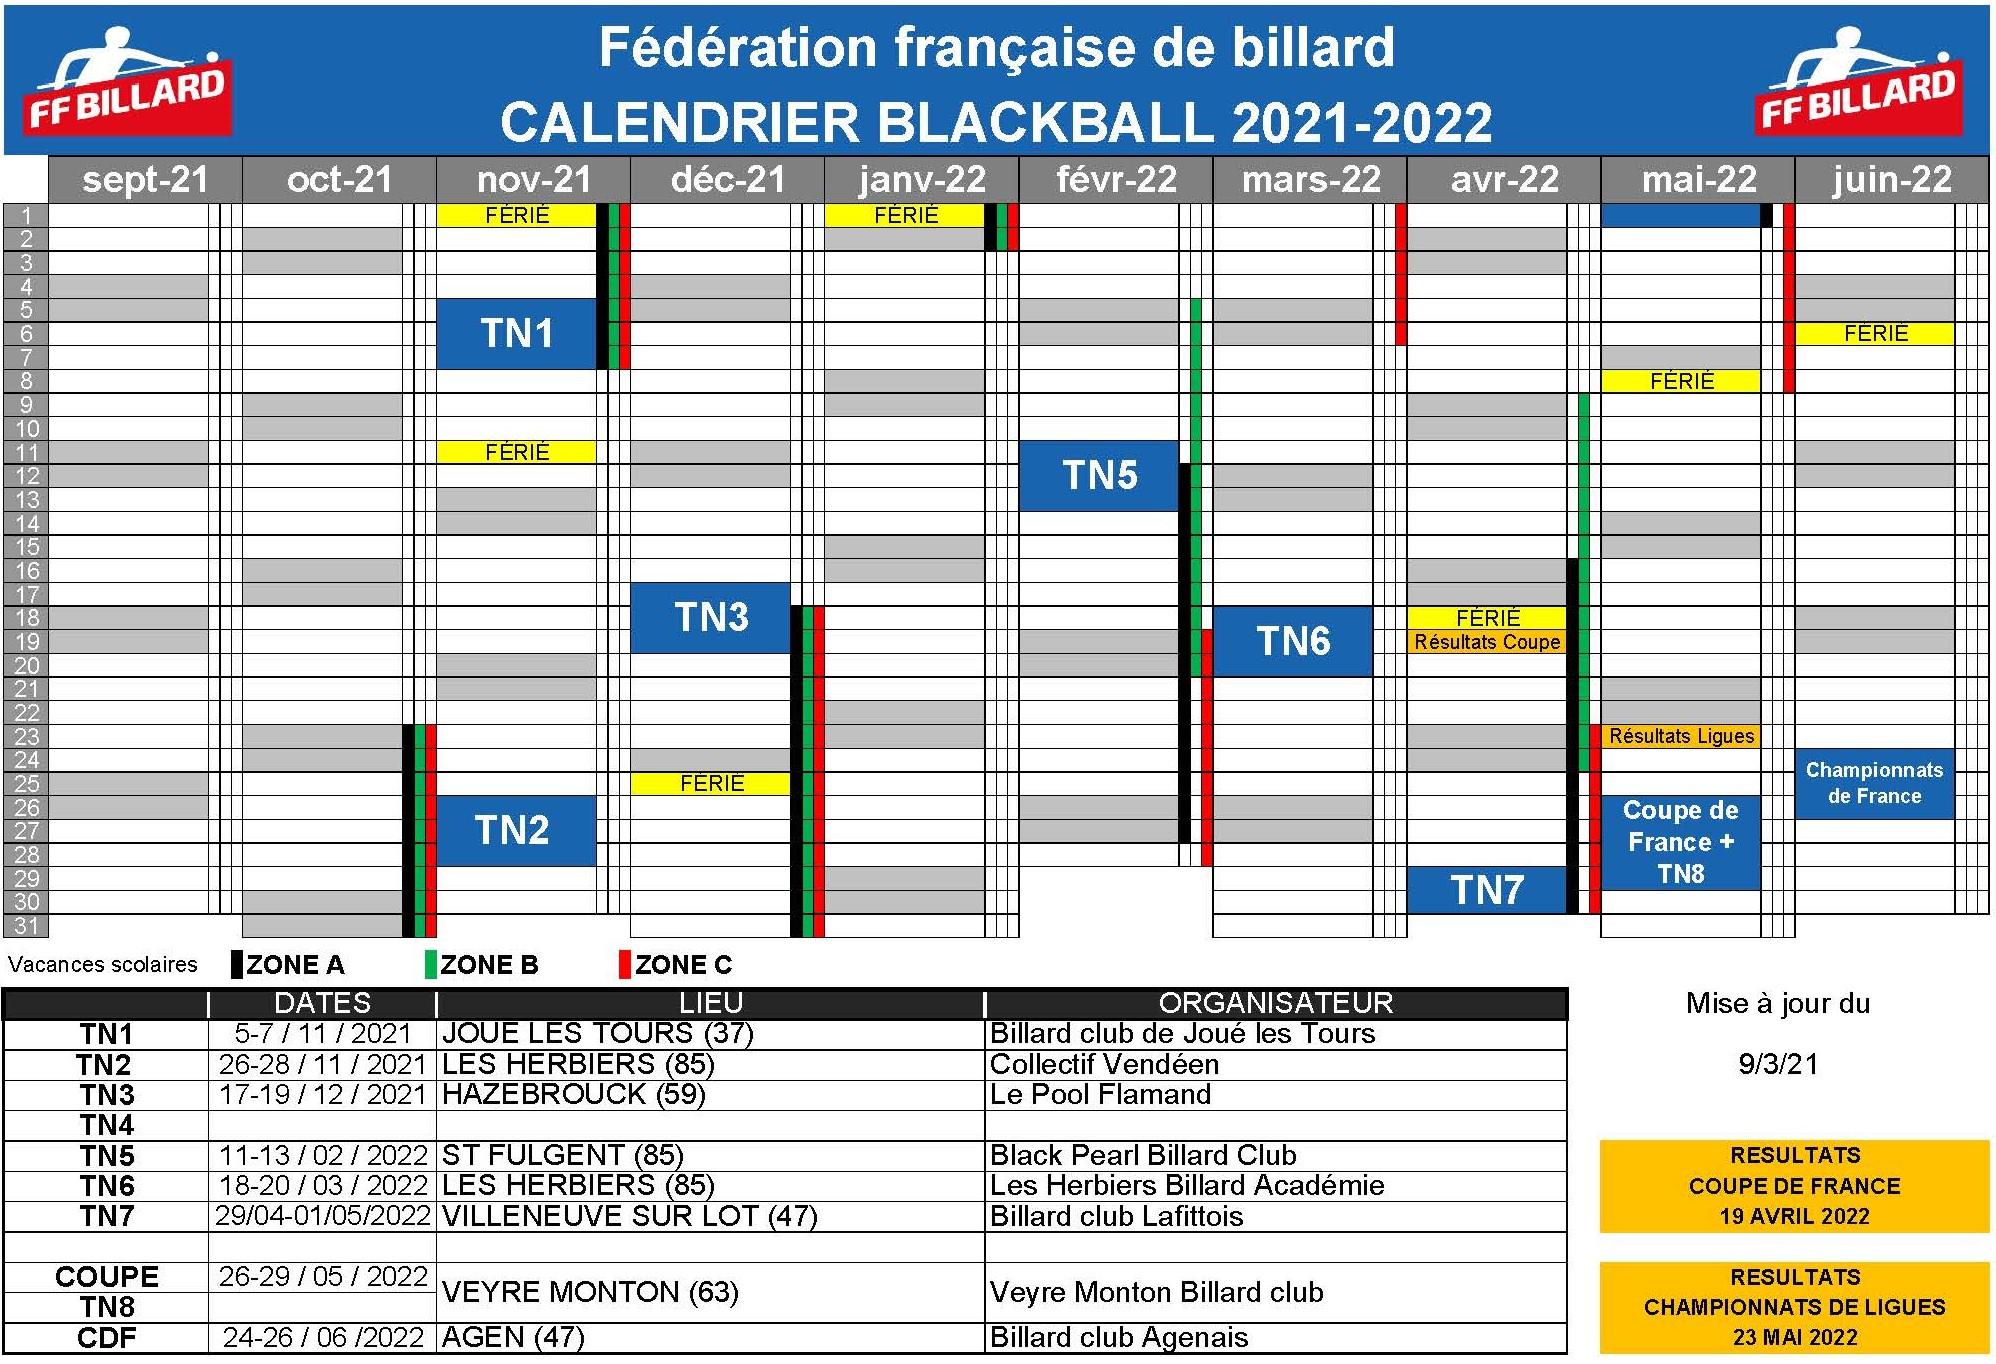 FFB Calendrier Blackball 2021 2022 du 09 03 2021